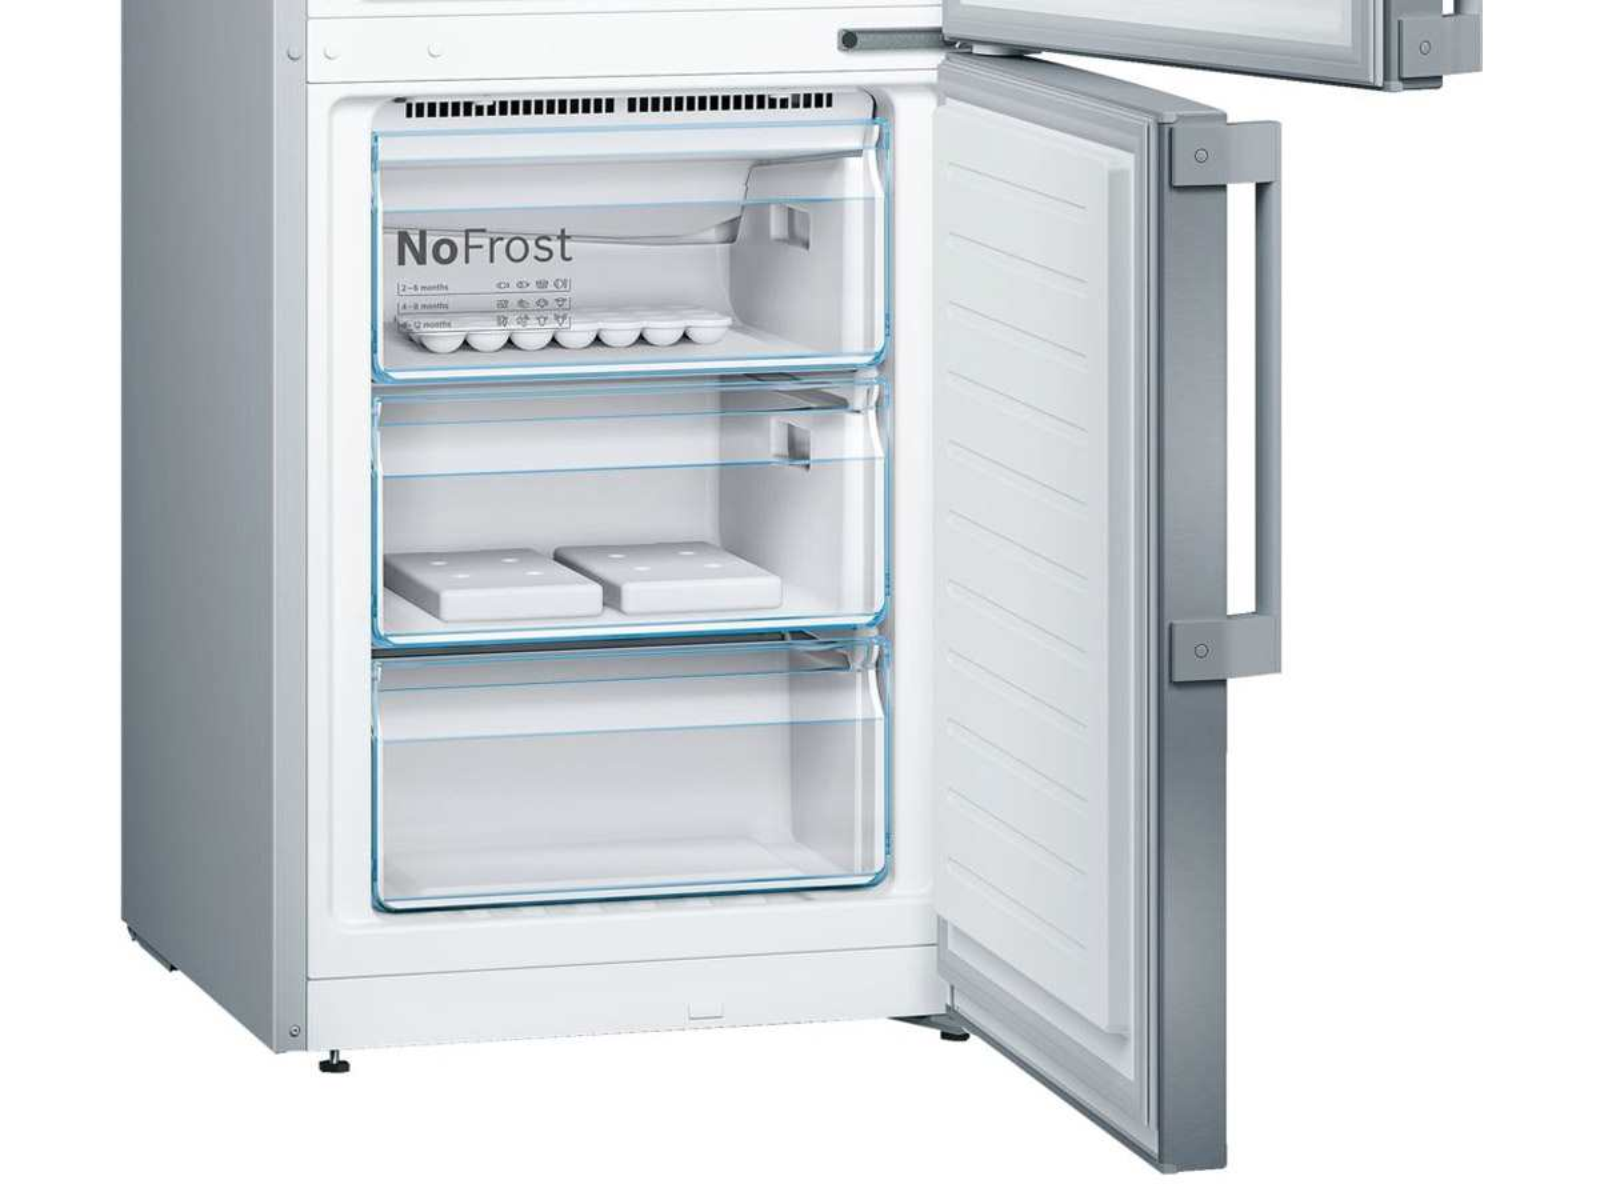 Amica Kühlschrank Kühlt Nicht Mehr : Bomann kühlschrank kühlt nicht mehr richtig side by side